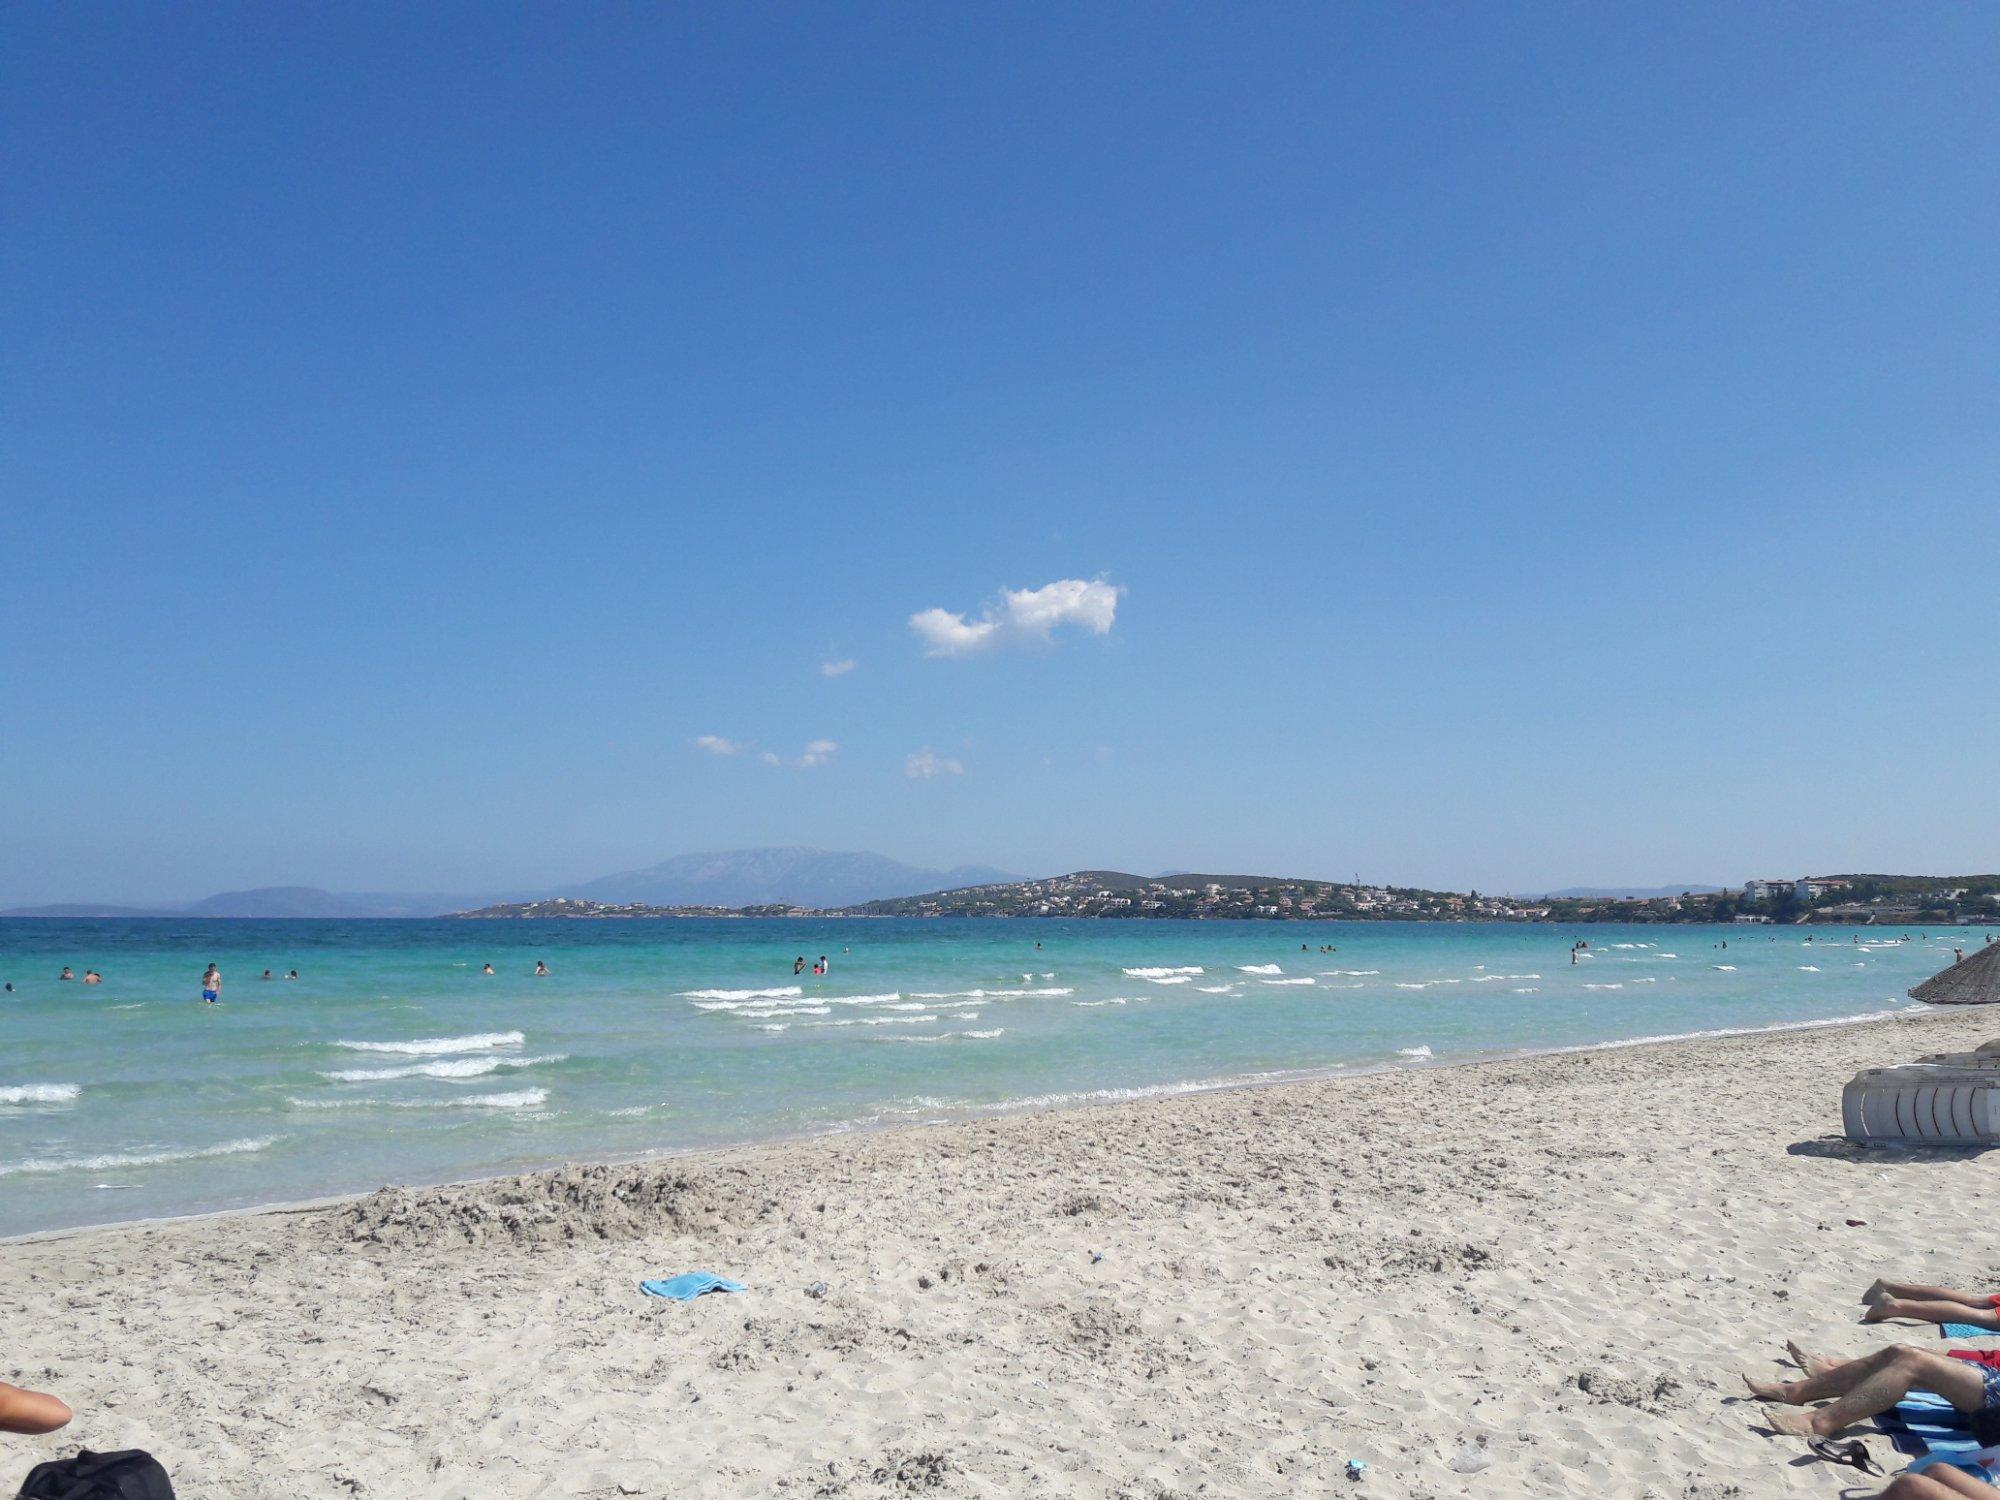 Playa de Ilica, Çeşme, Turquia